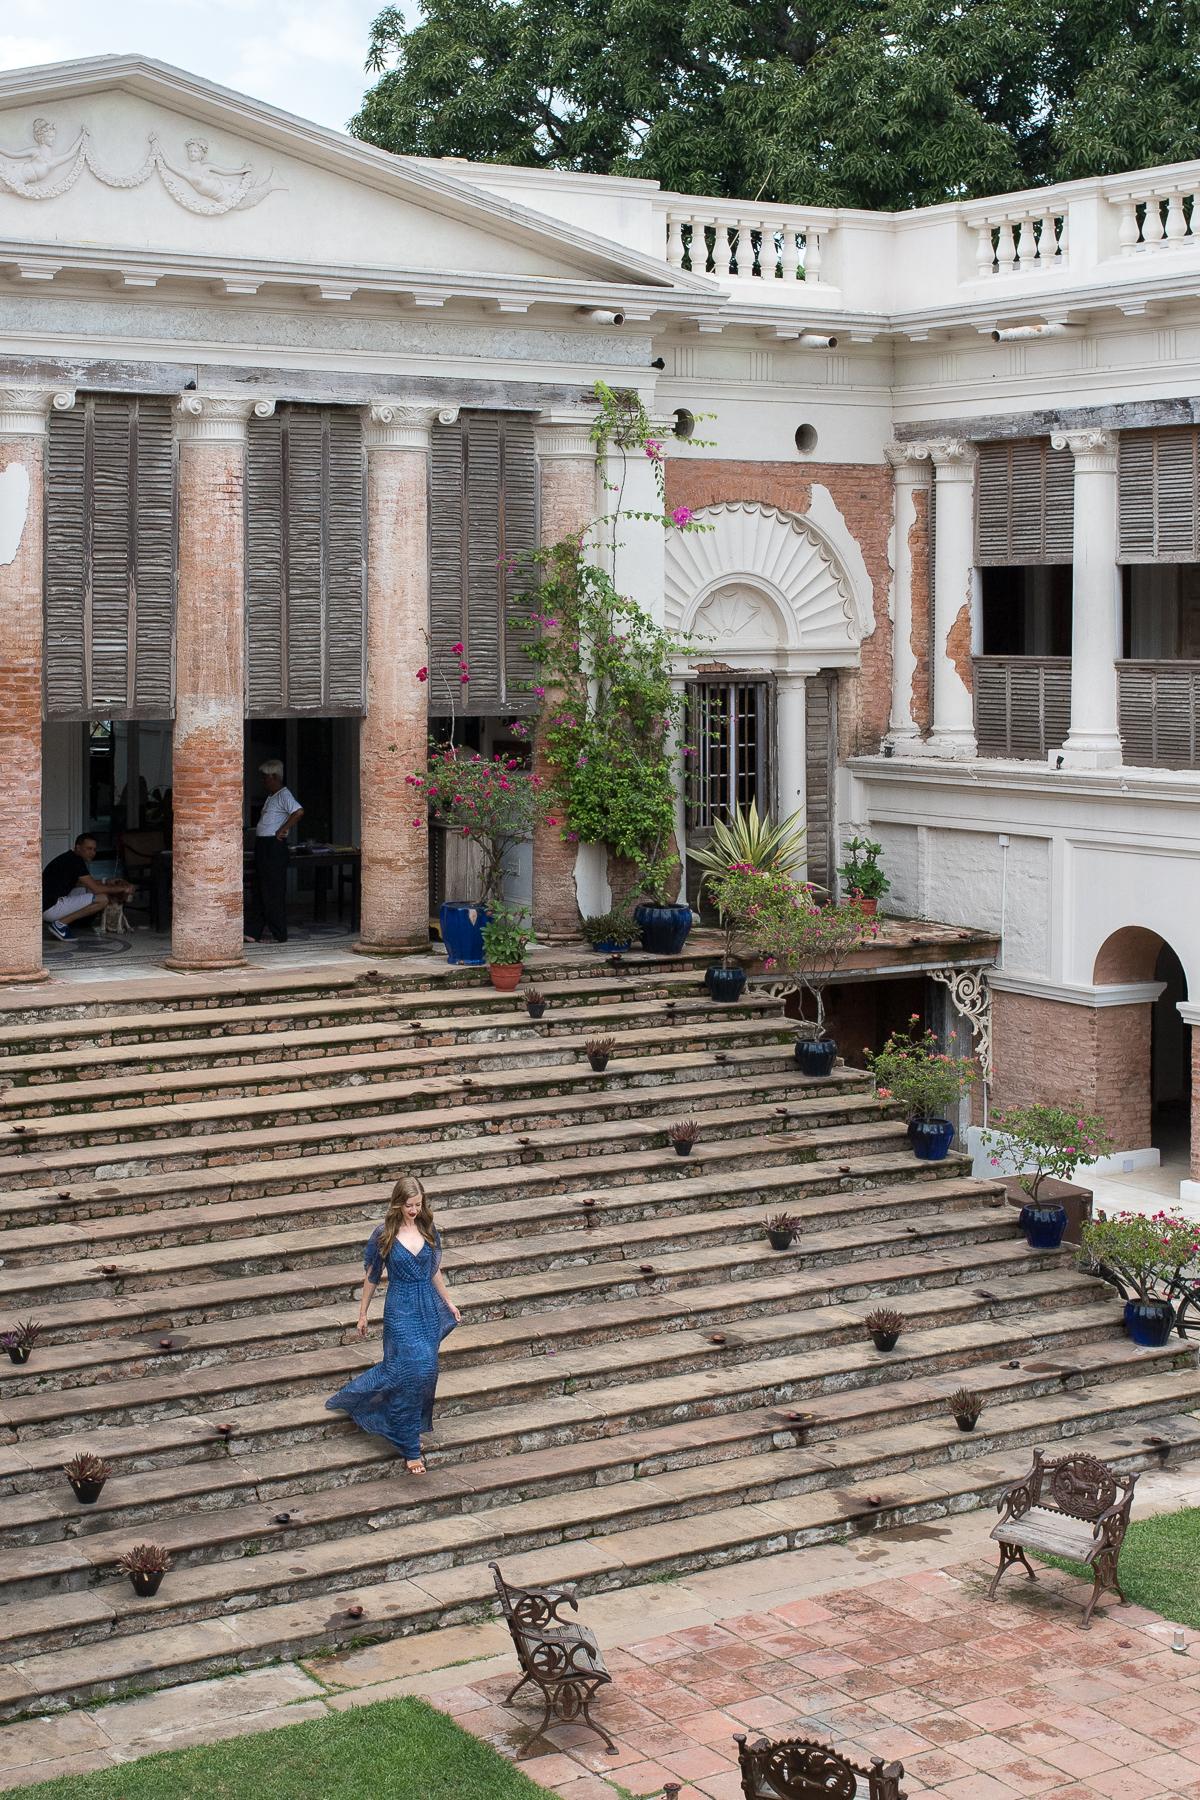 Stacie Flinner The Rajbari Bawali Heritage Hotel Calcutta-31.jpg